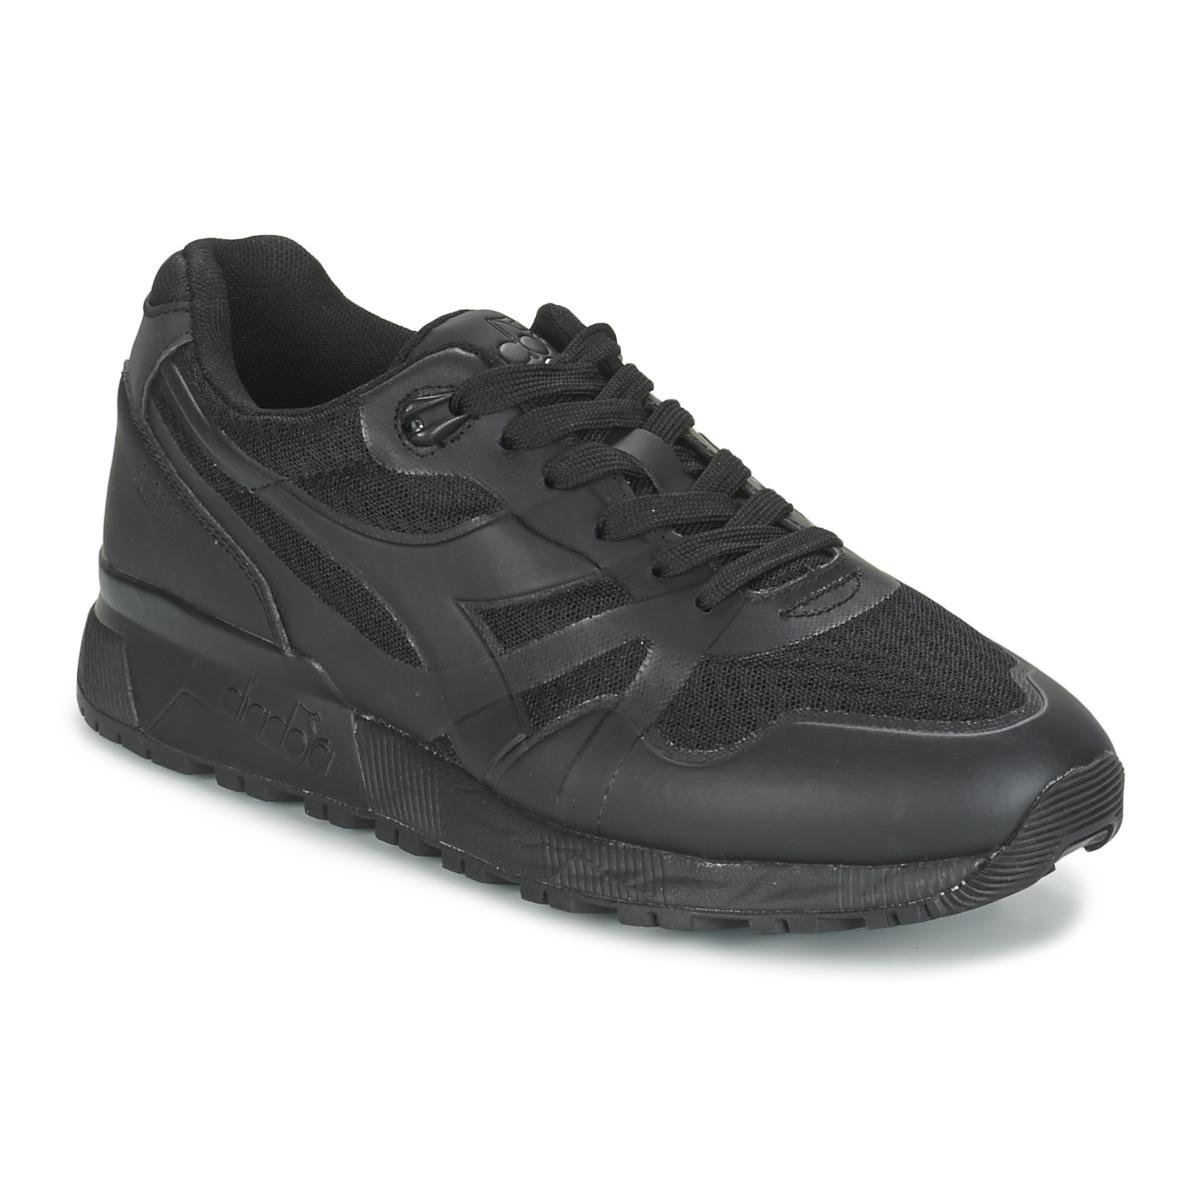 Diadora N9000 MM II Schwarz - Kostenloser Versand bei Spartoode ! - Schuhe Sneaker Low Herren 81,00 €